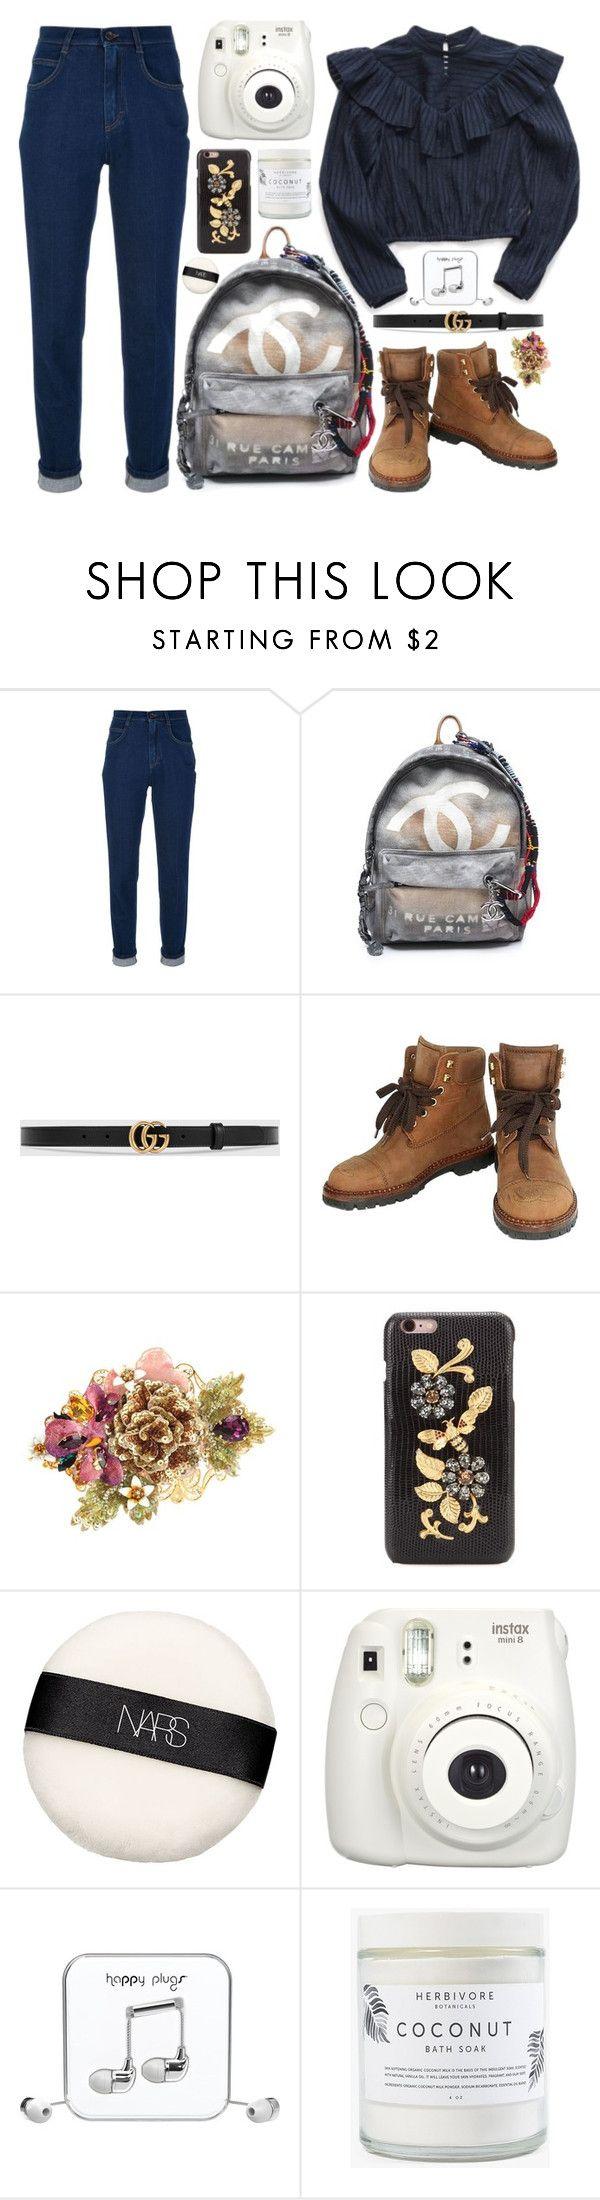 """Work"" by natjulieta on Polyvore featuring moda, Dolce&Gabbana, Chanel, Gucci, NARS Cosmetics, Fujifilm, Happy Plugs, Herbivore, ootd y Coordinates"